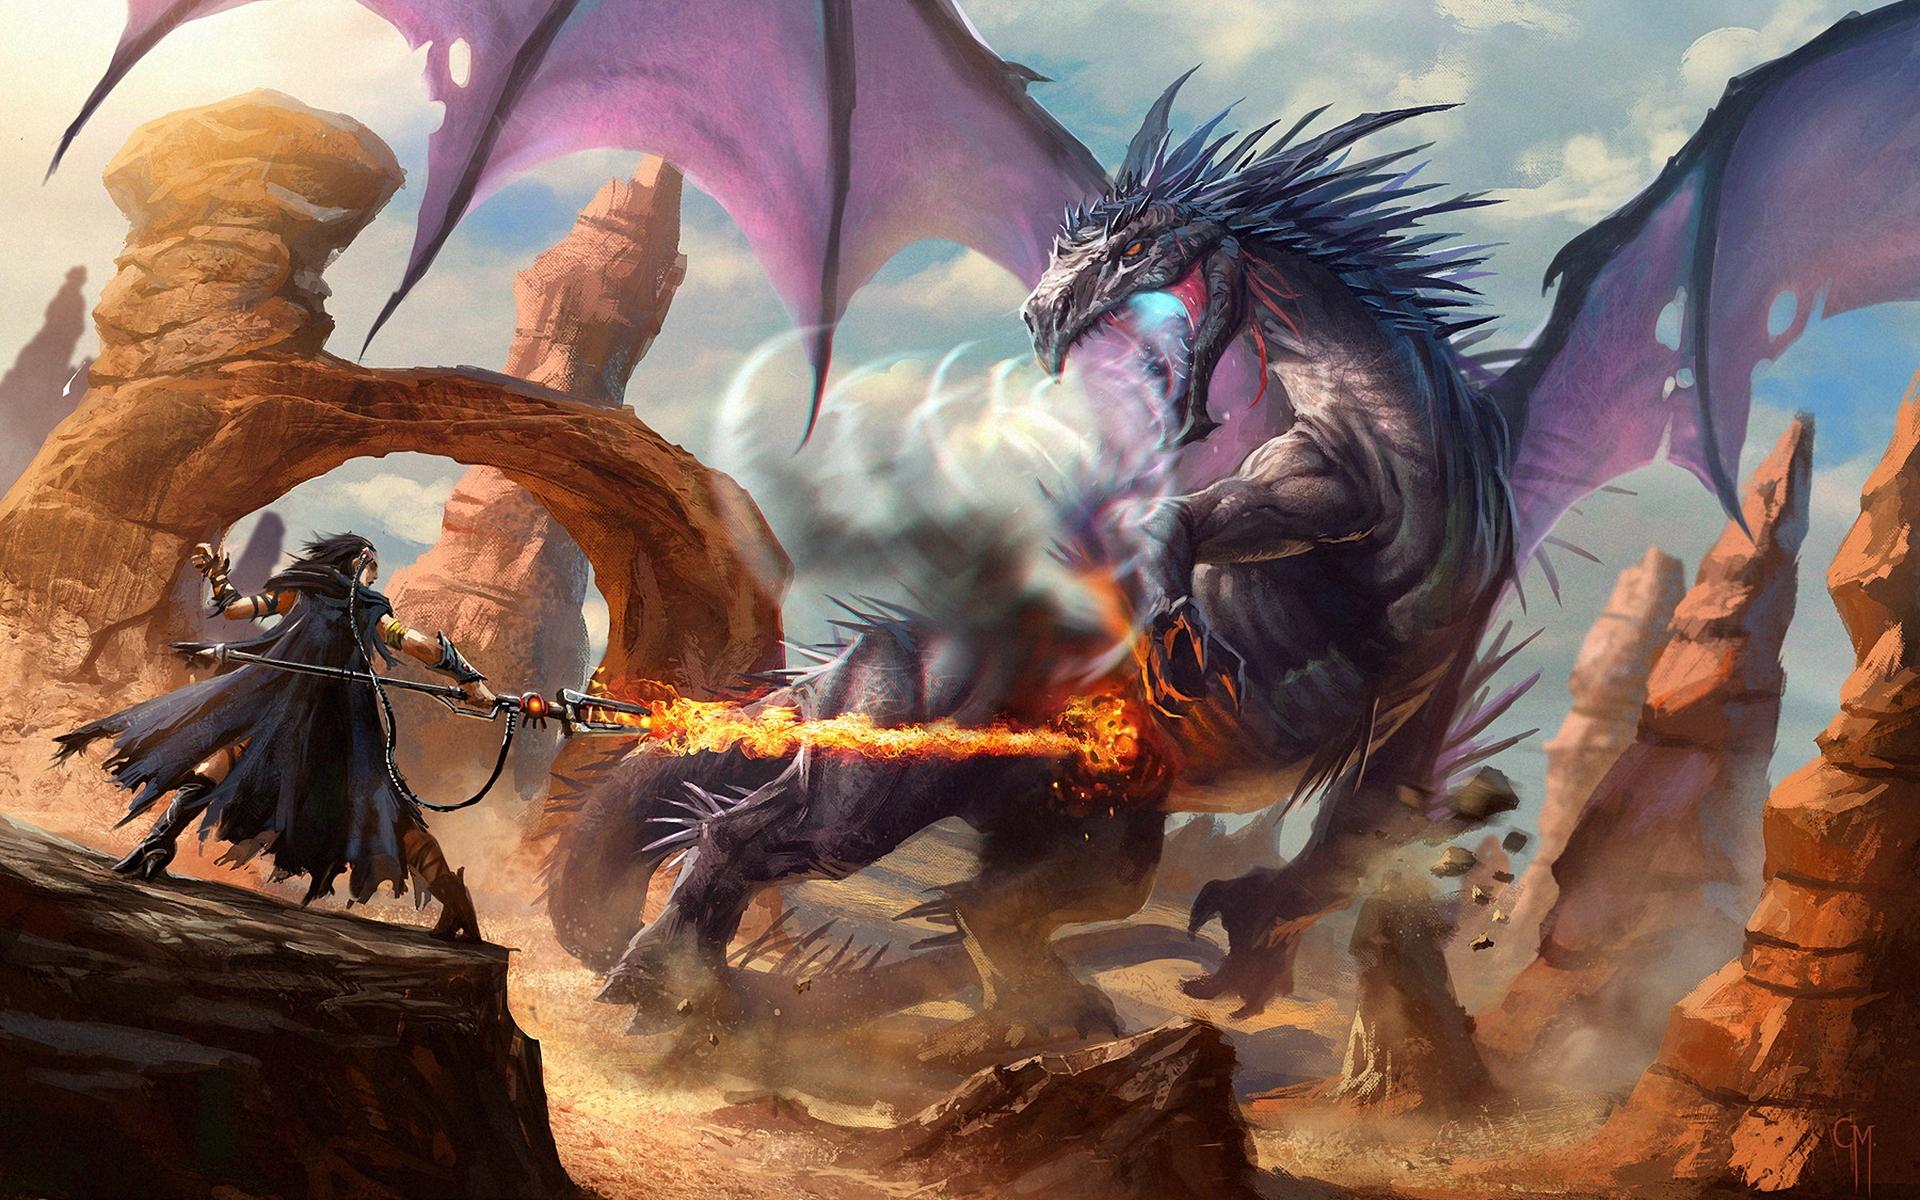 dragons fantasy wallpaper 1920x1200 - photo #36